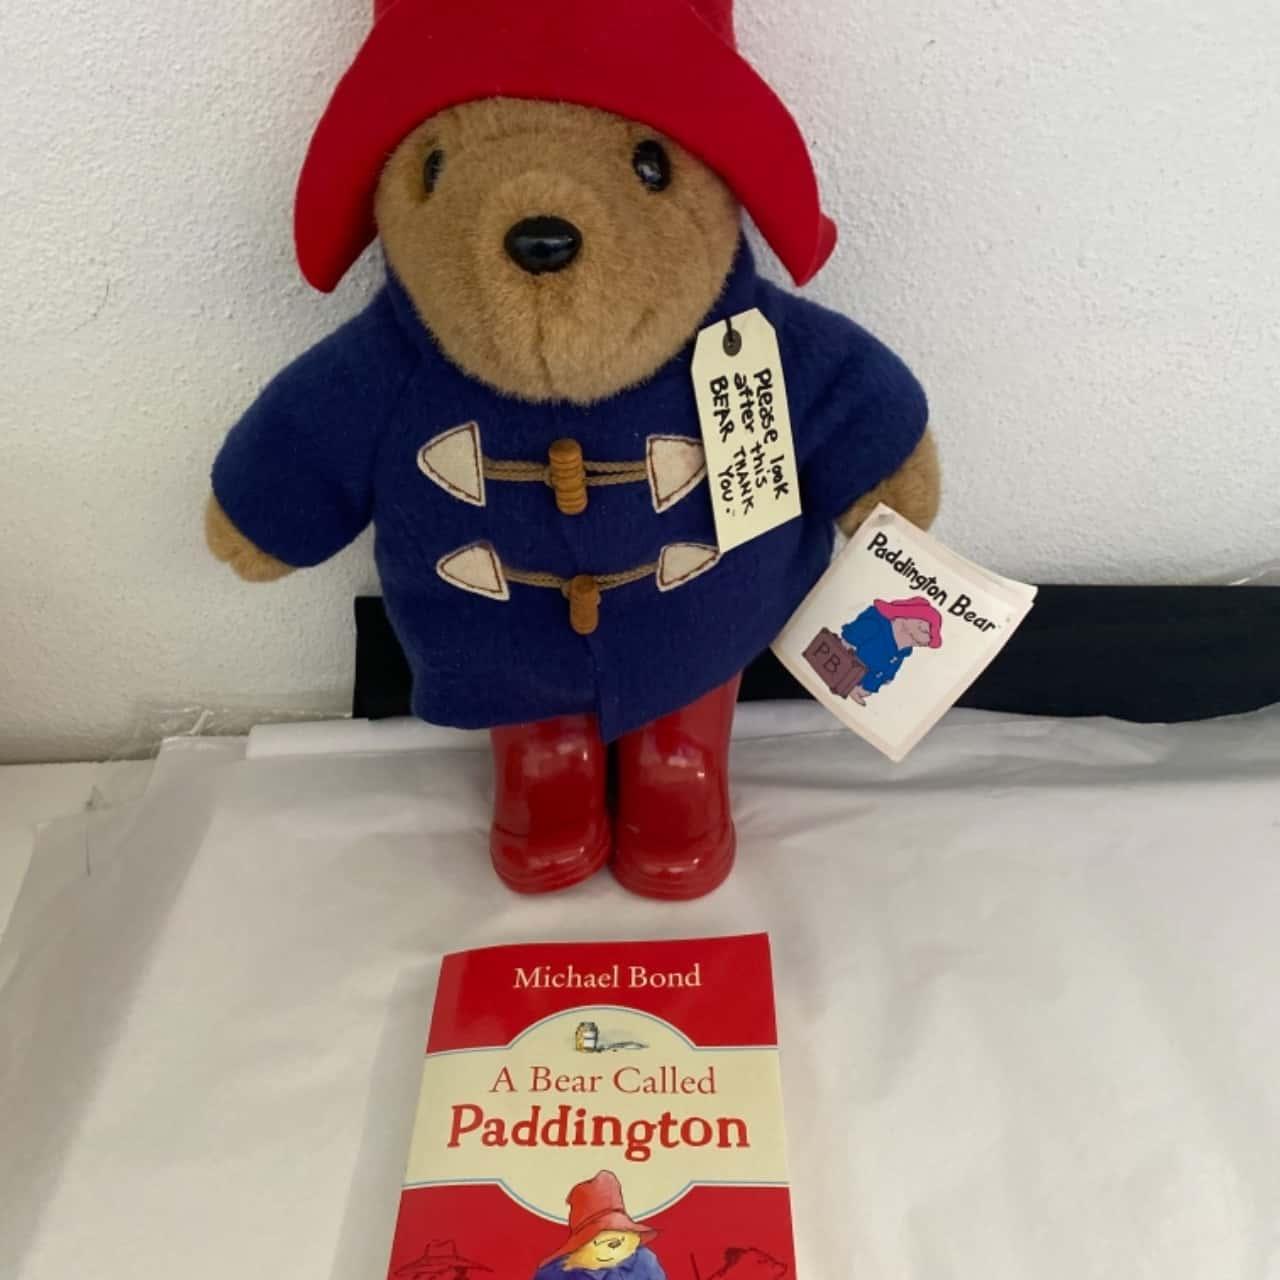 New Paddington bear and book